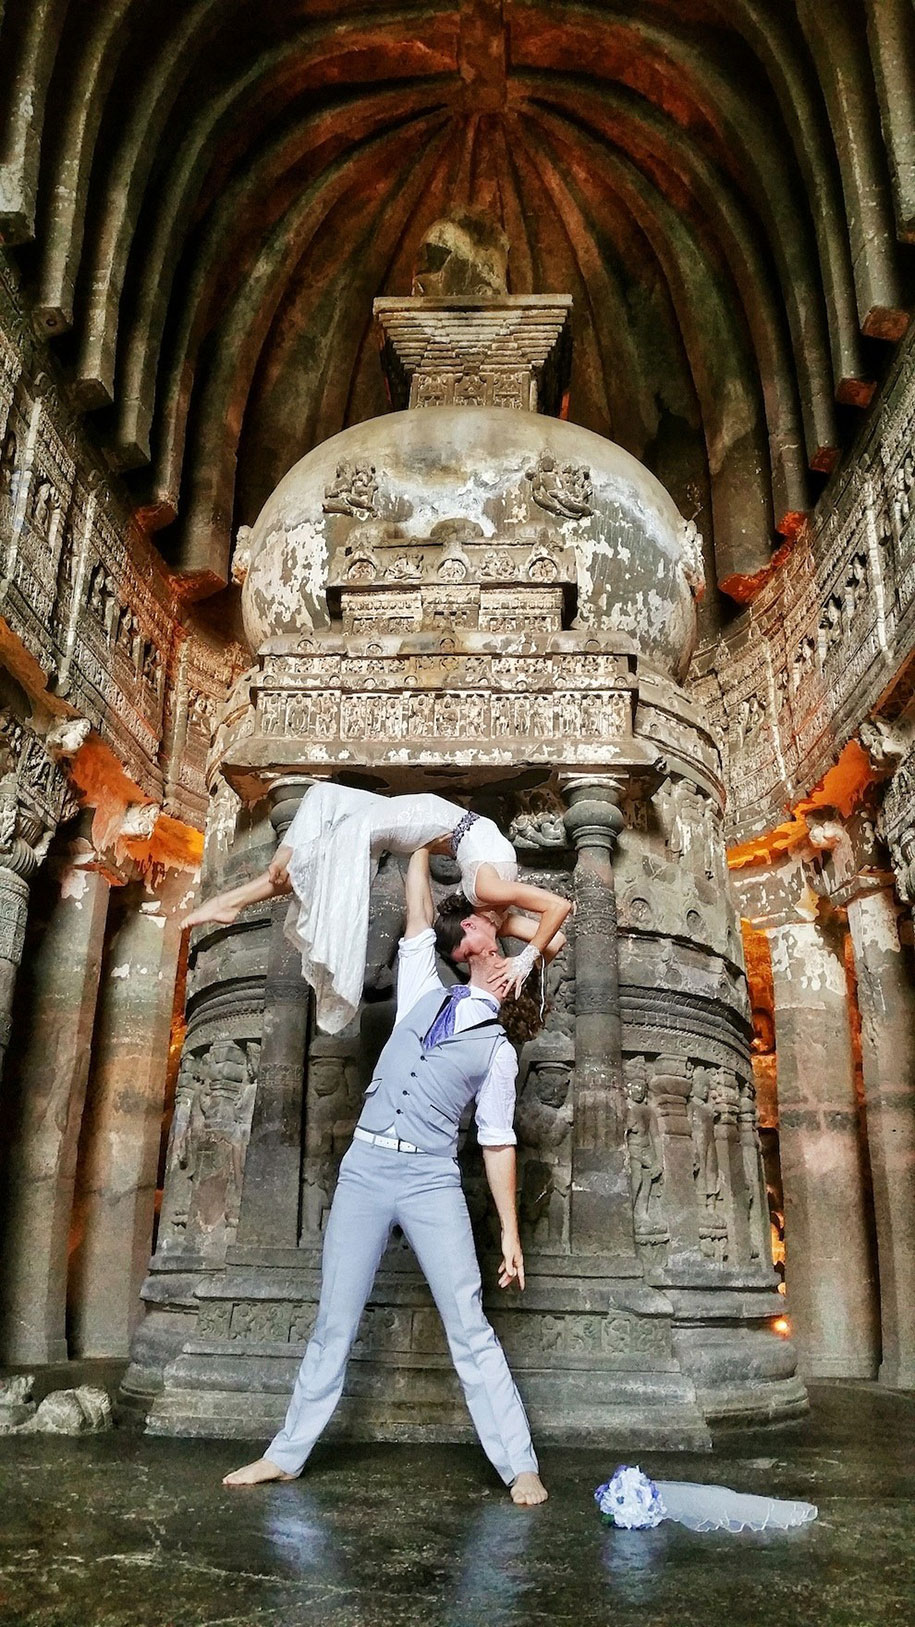 couple-wedding-around-the-world-travel-cheetah-rhian-3